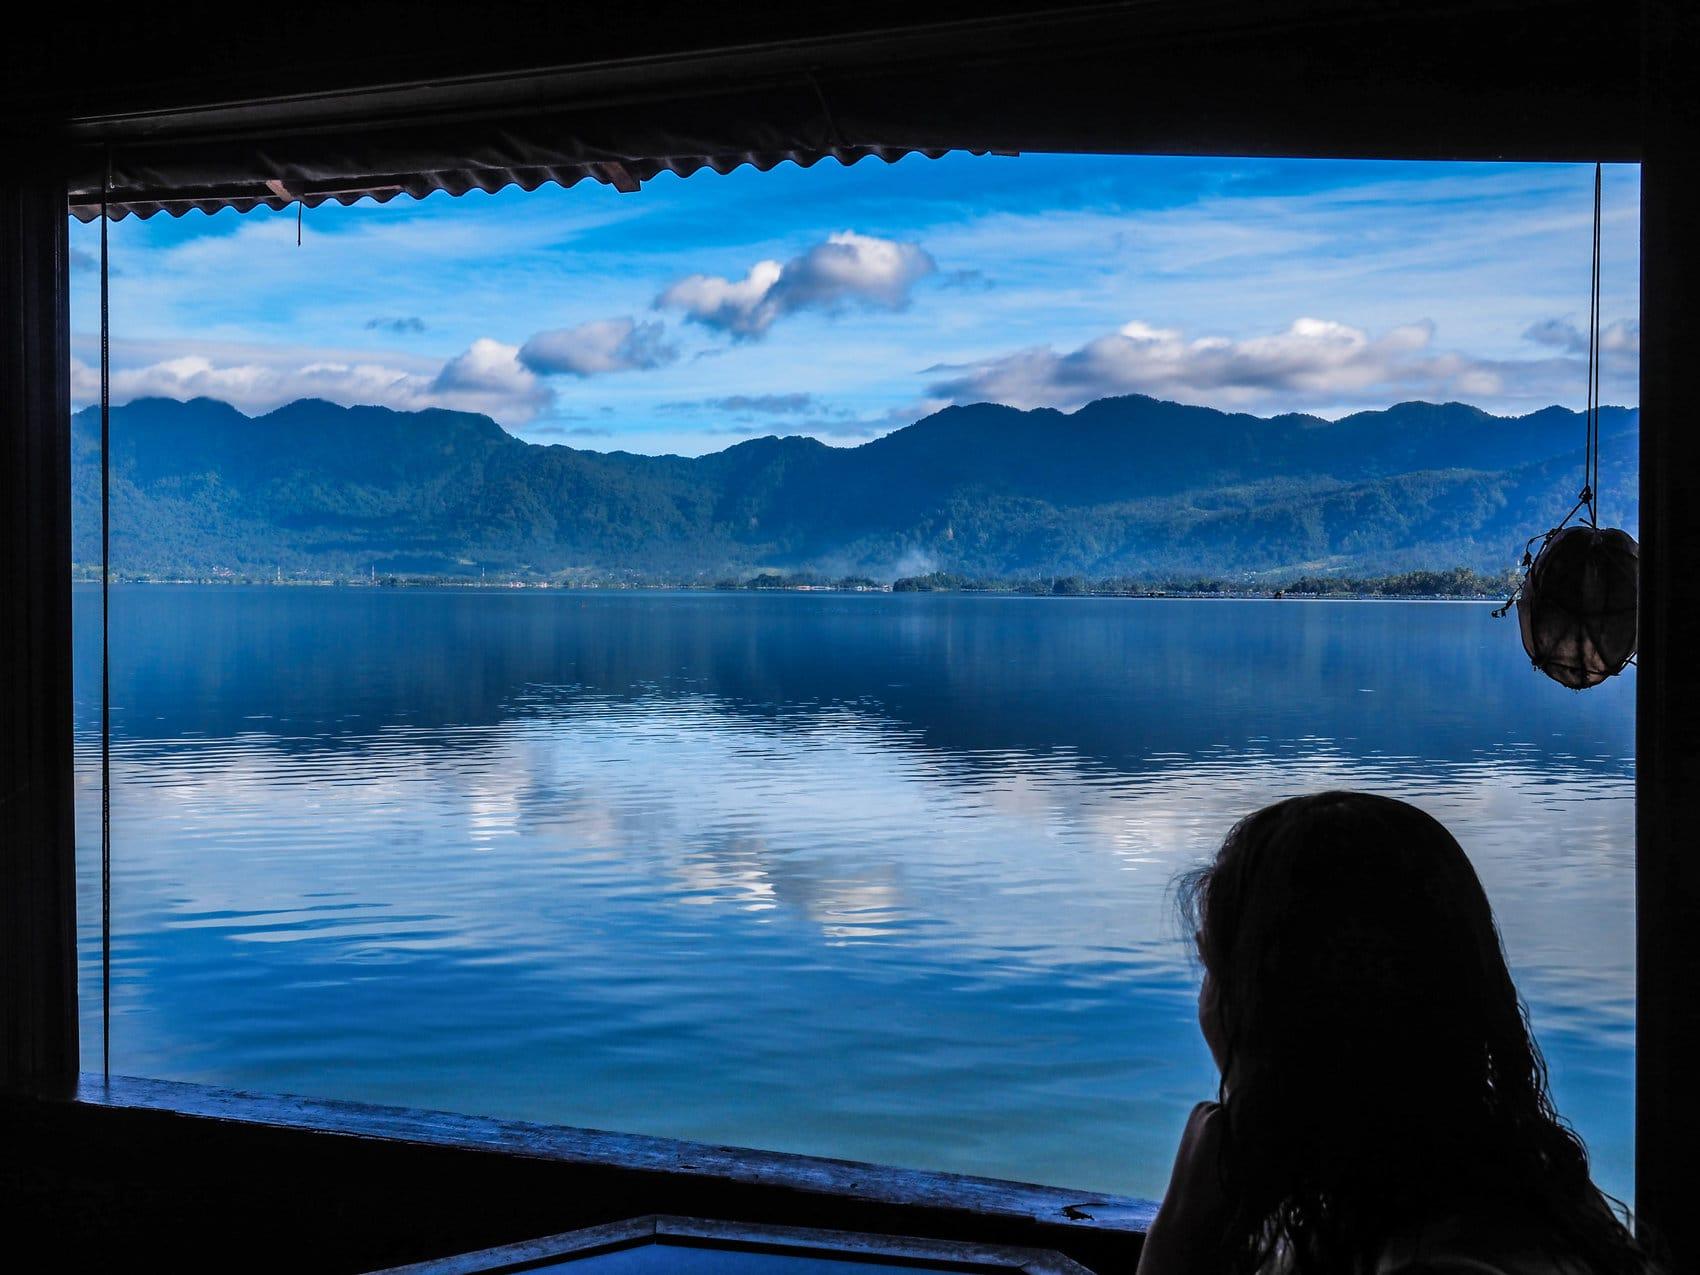 Sumatra lac Maninjau